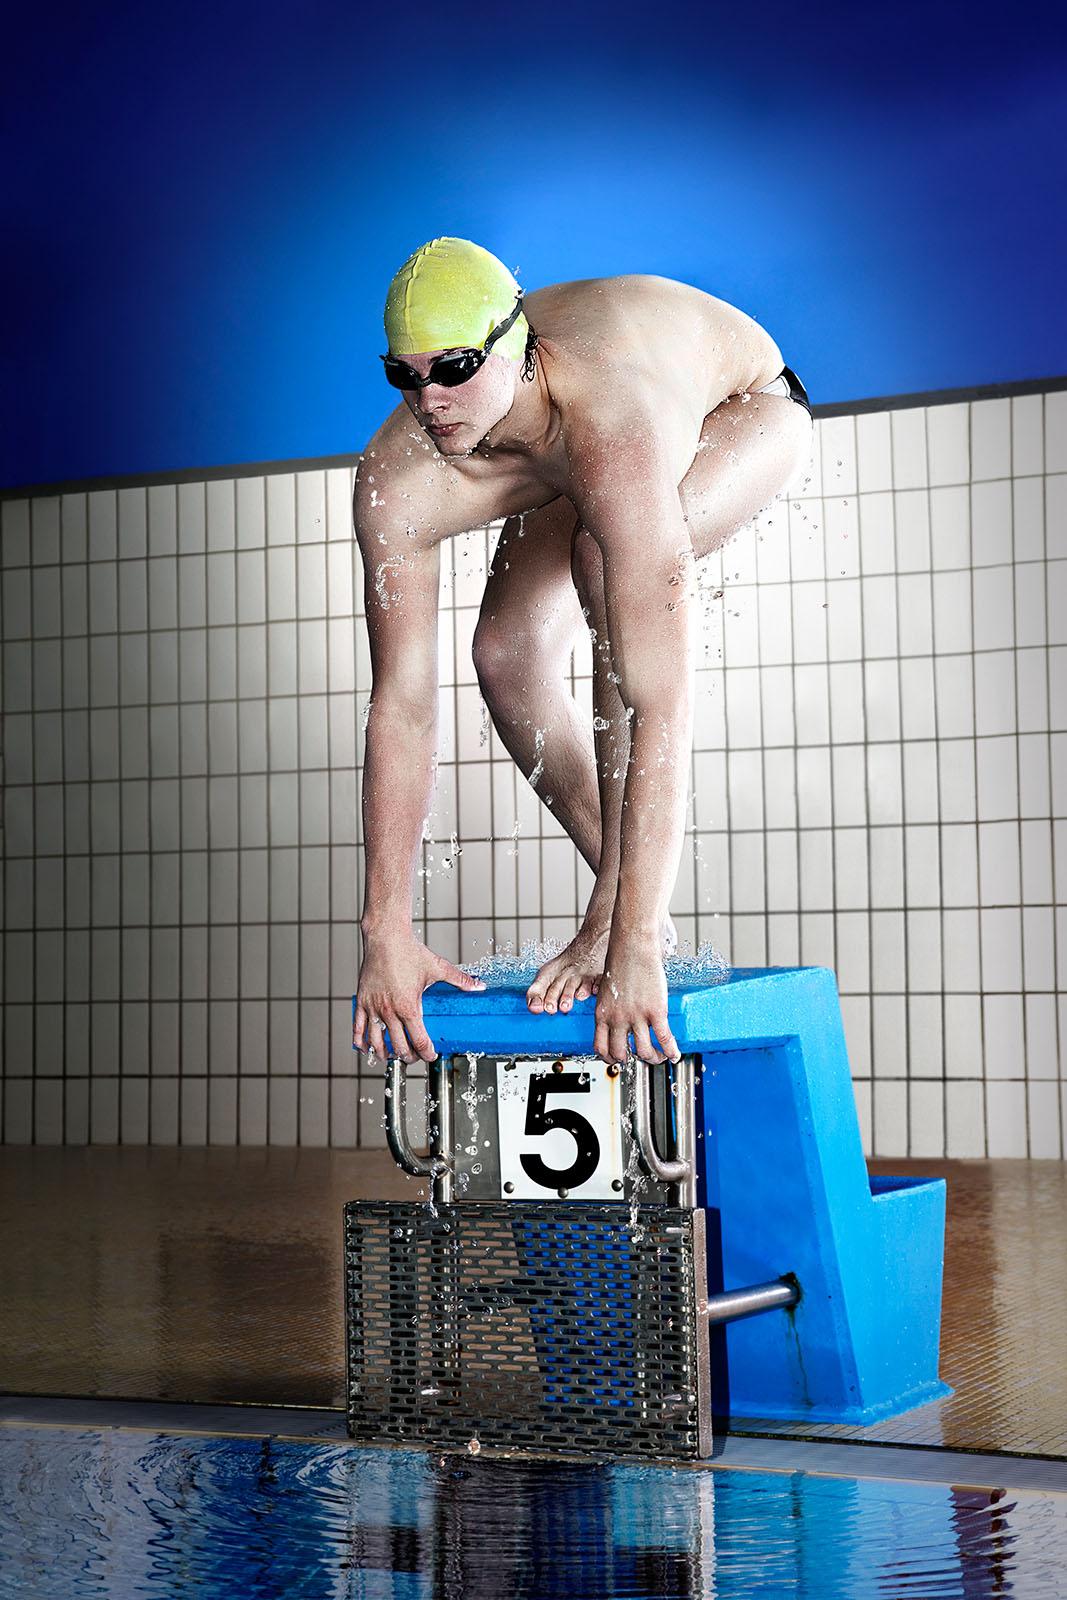 VL_sports_swimming_01